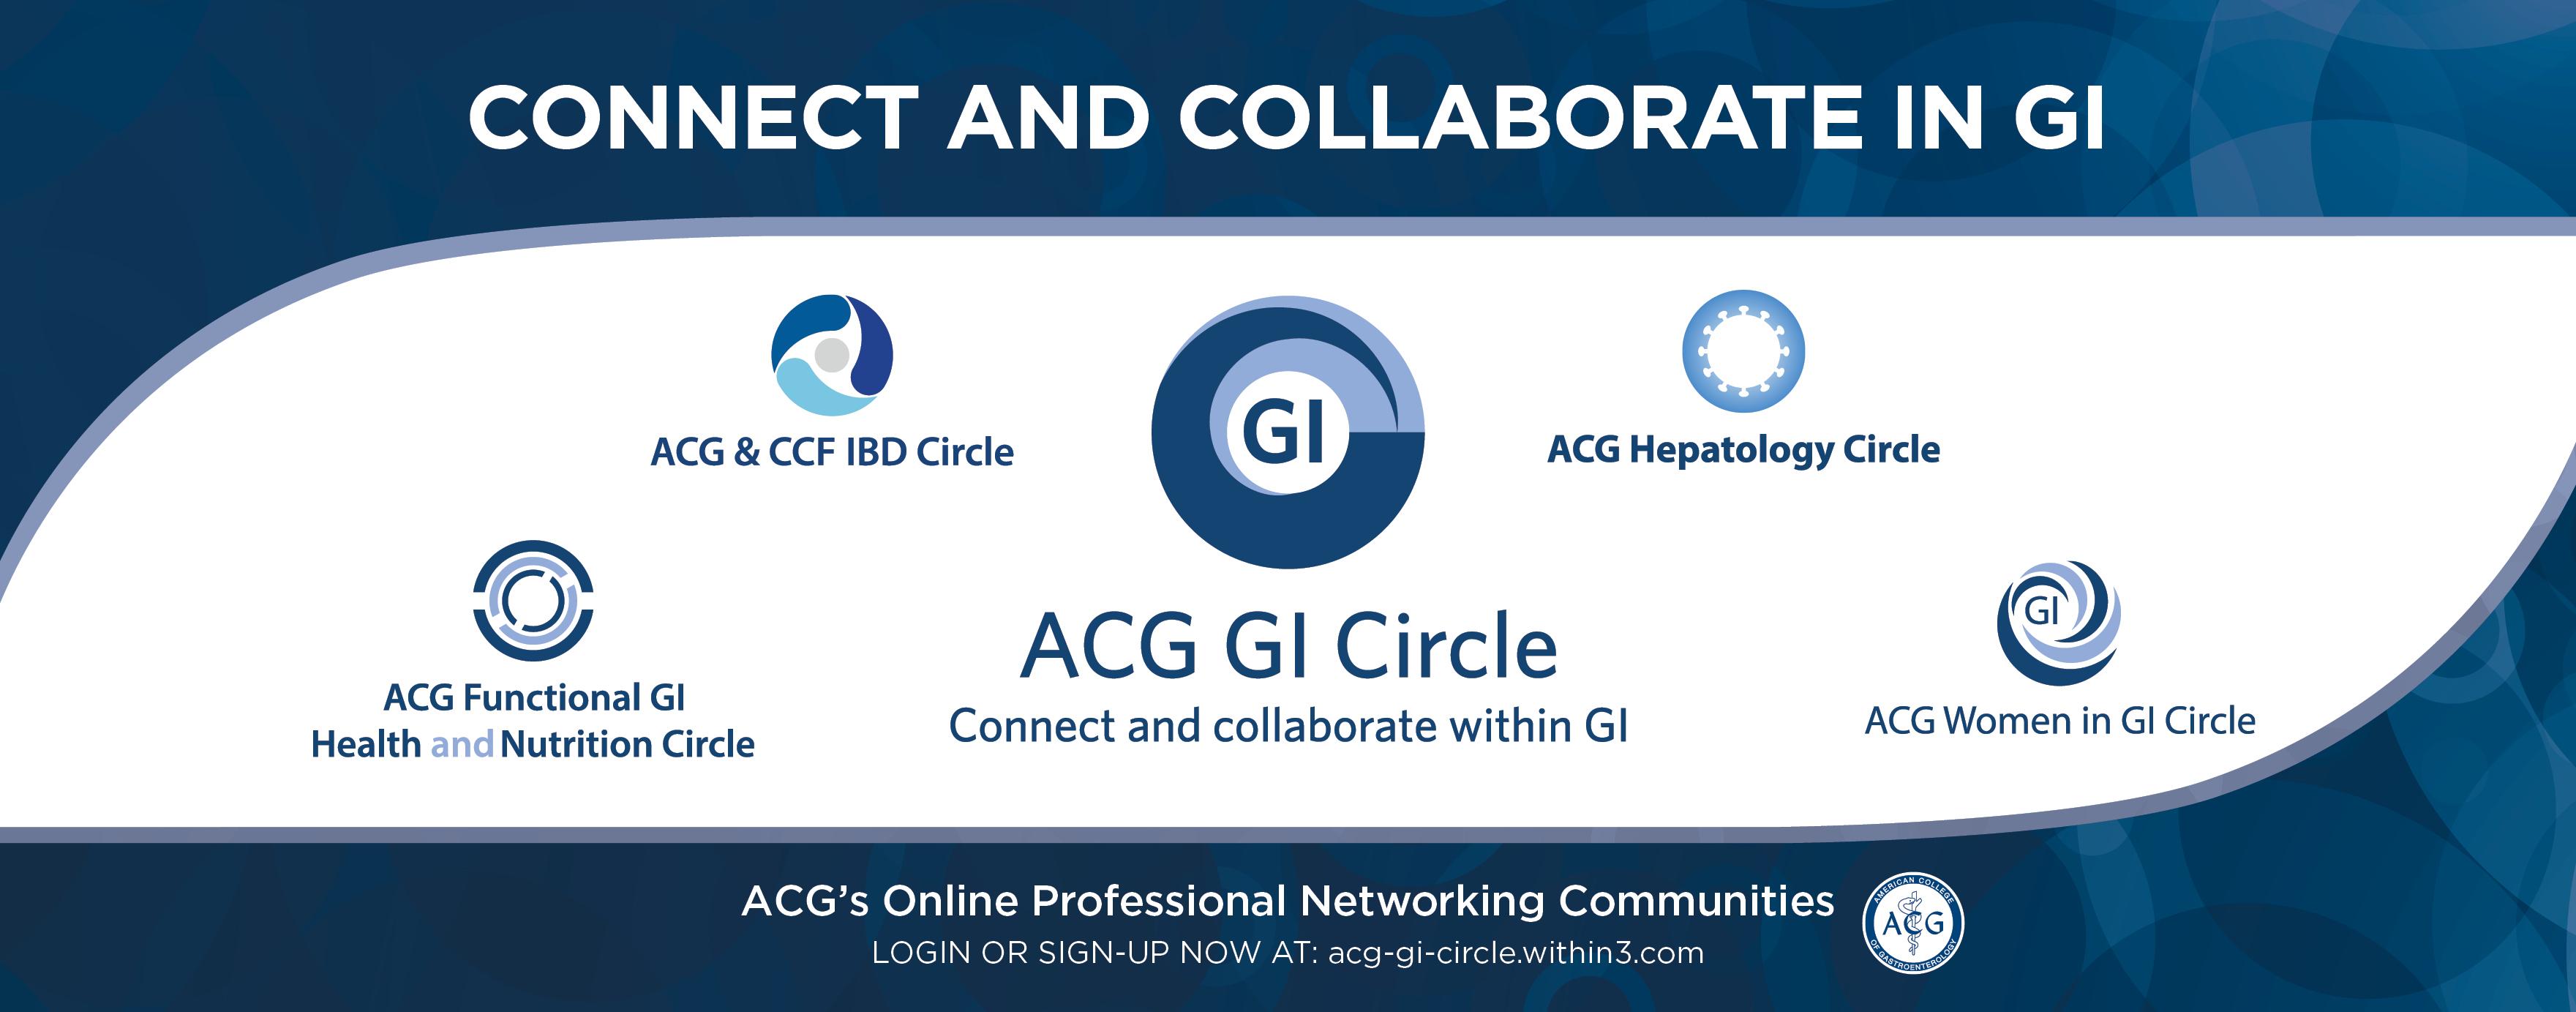 gi circles